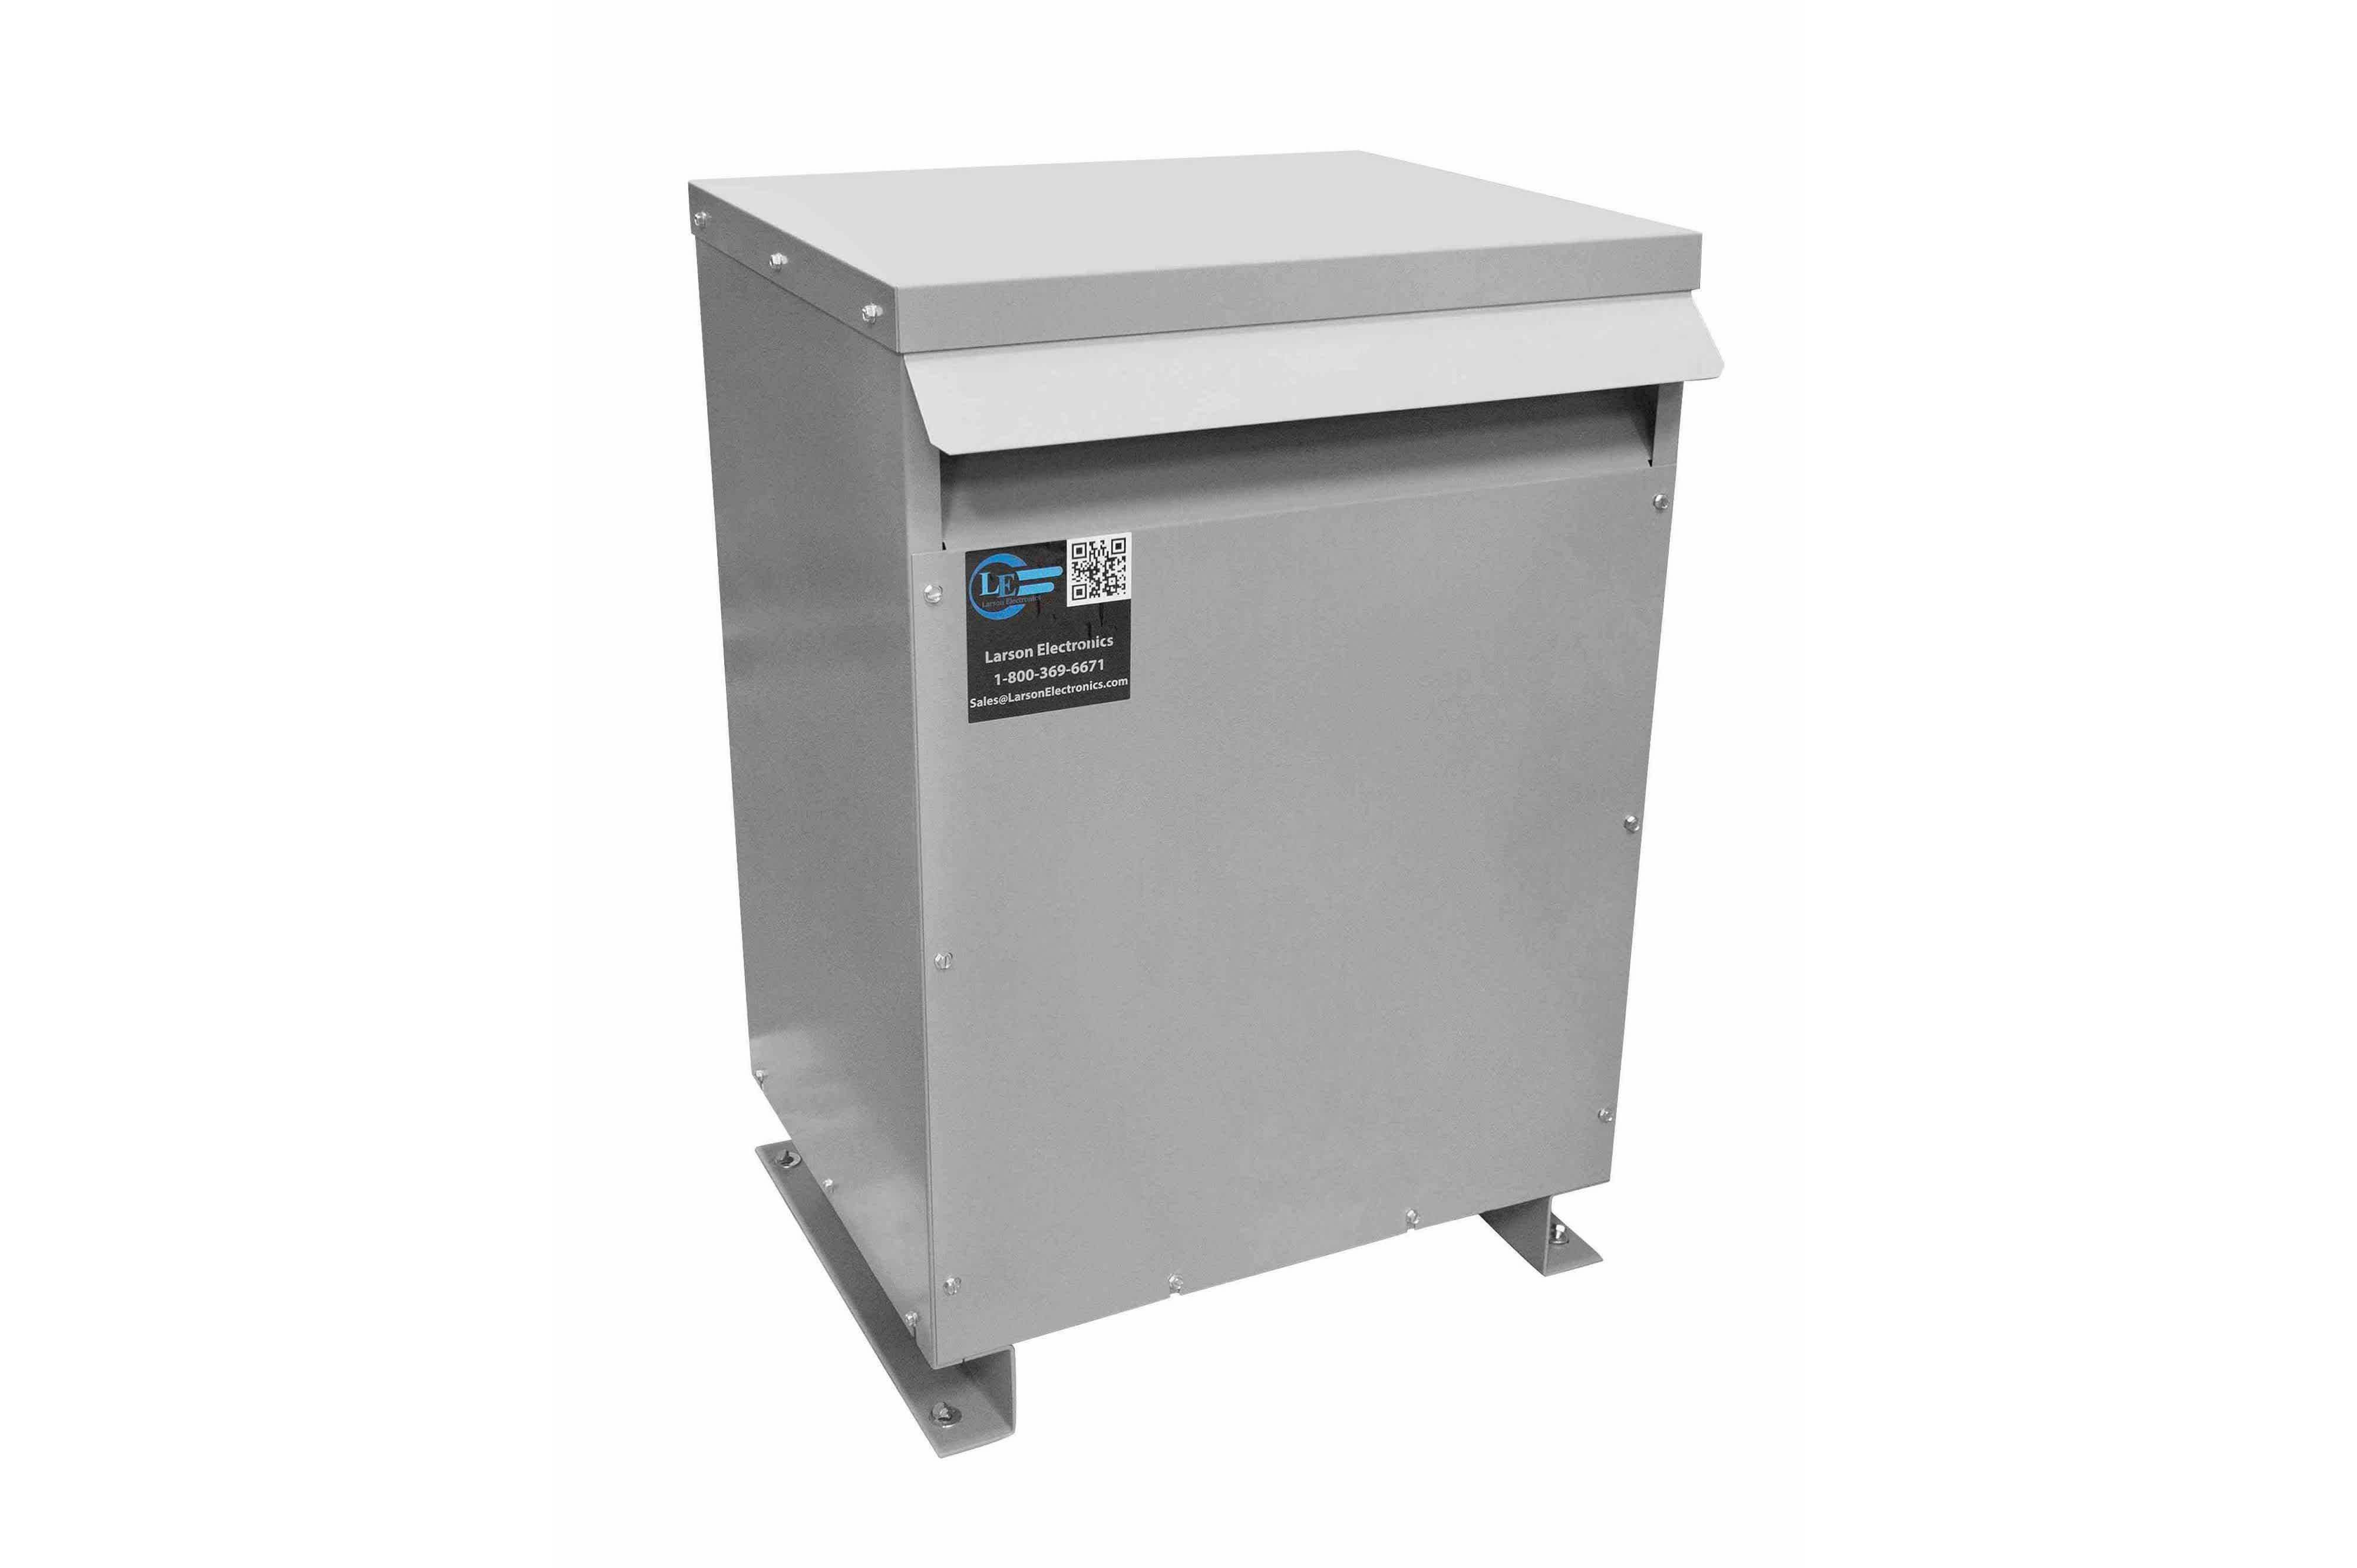 25 kVA 3PH Isolation Transformer, 208V Wye Primary, 208Y/120 Wye-N Secondary, N3R, Ventilated, 60 Hz